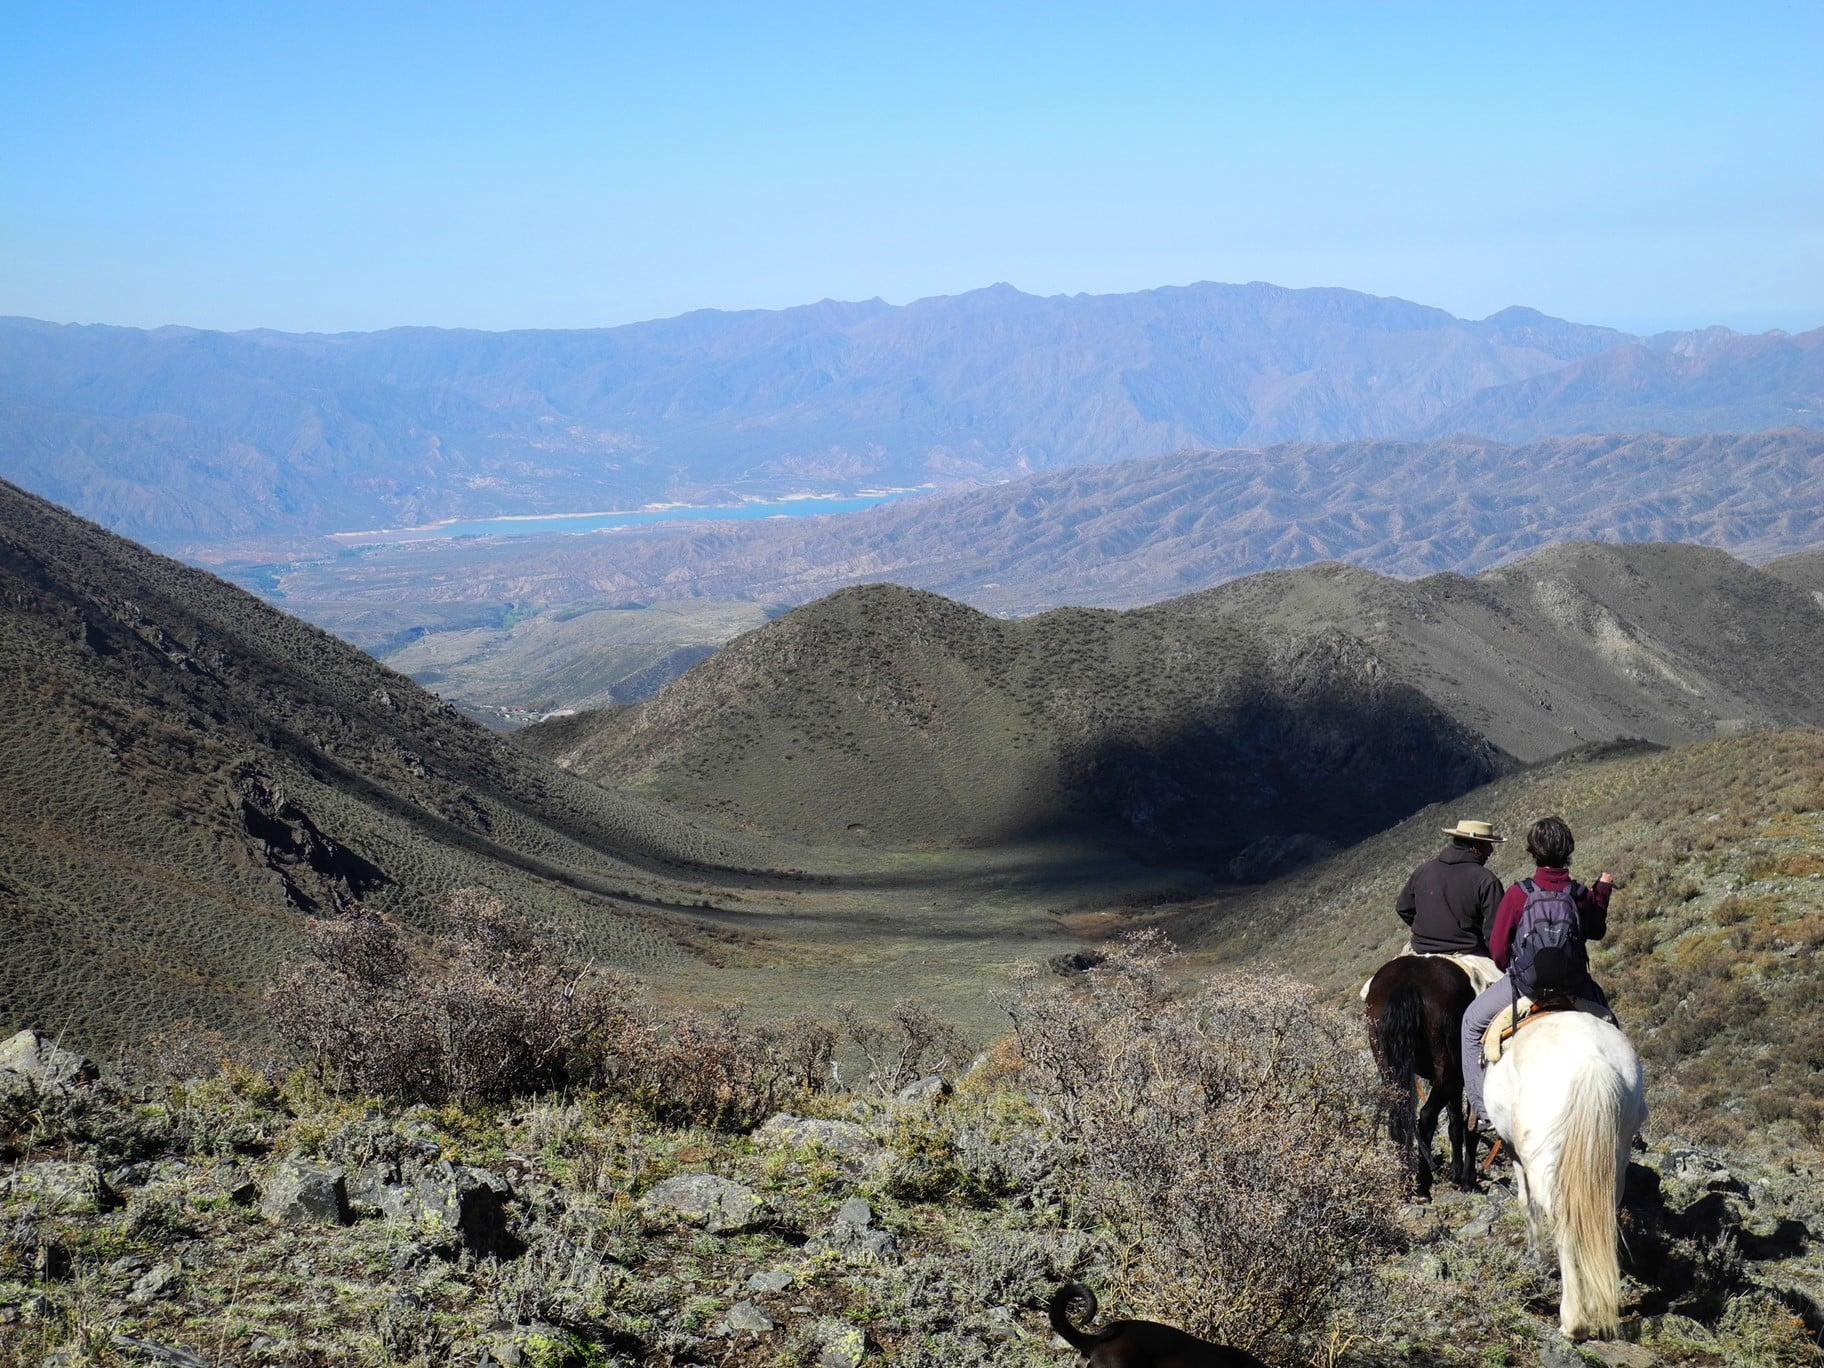 wine-TROTTERS_wine-tourism-agency_tour_trekking_hiking_horseback-riding_Andes_110 WEB.jpg